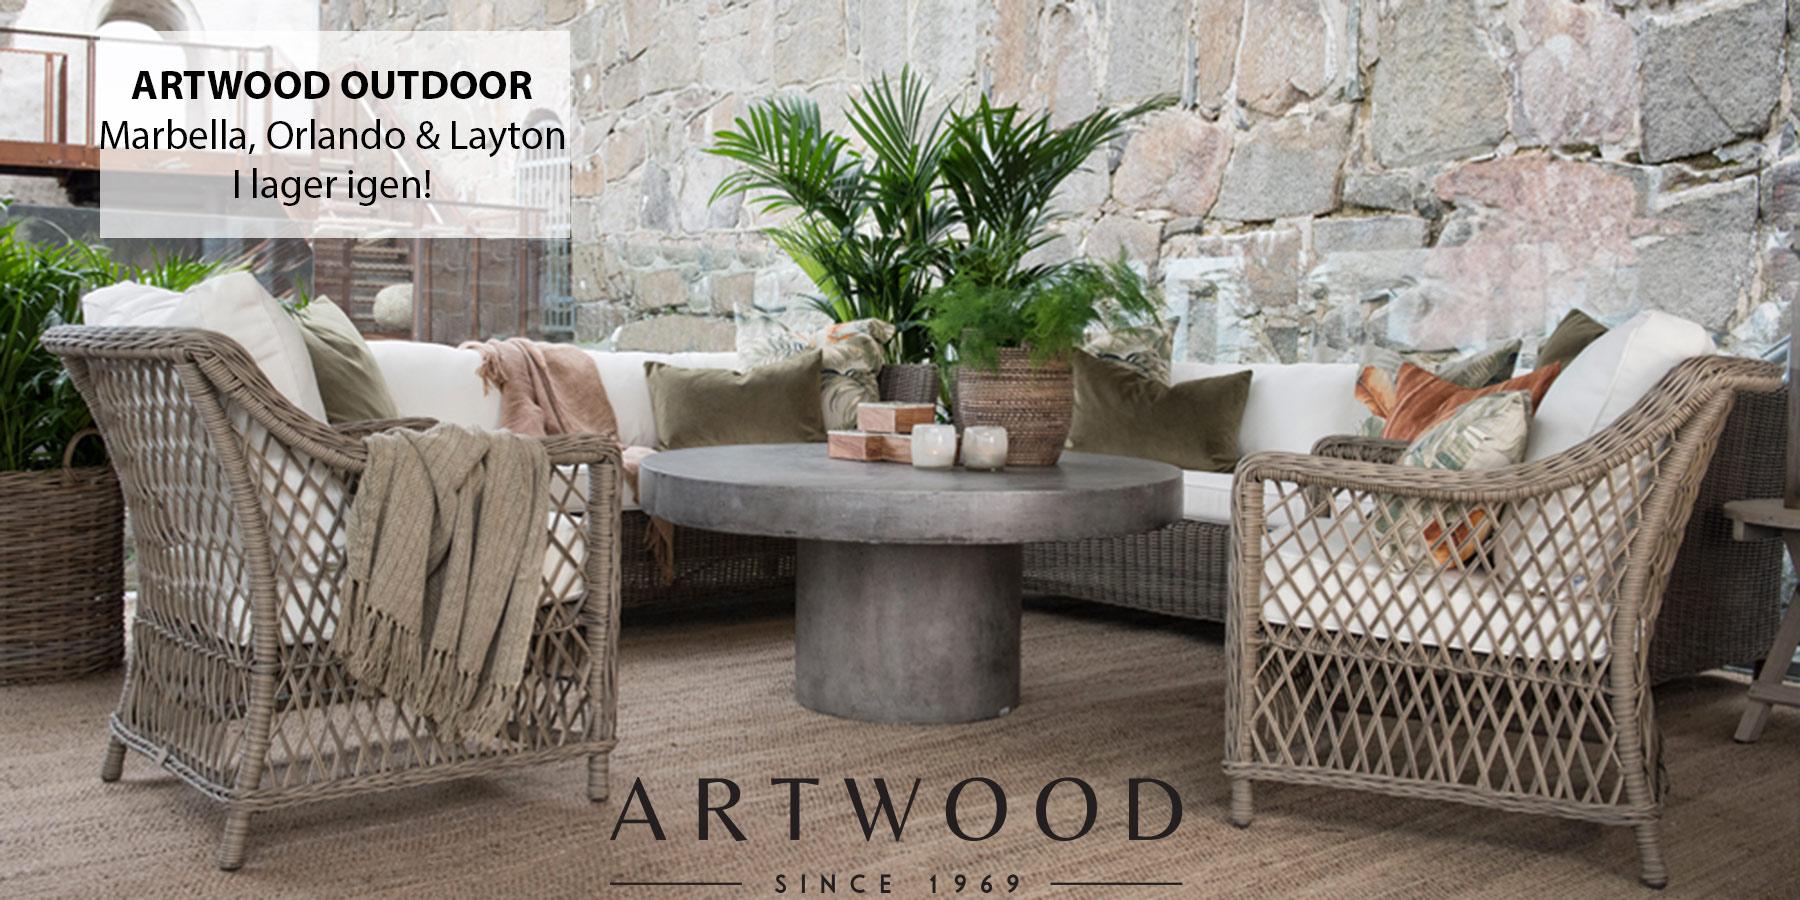 Artwood-framsida-2.jpg